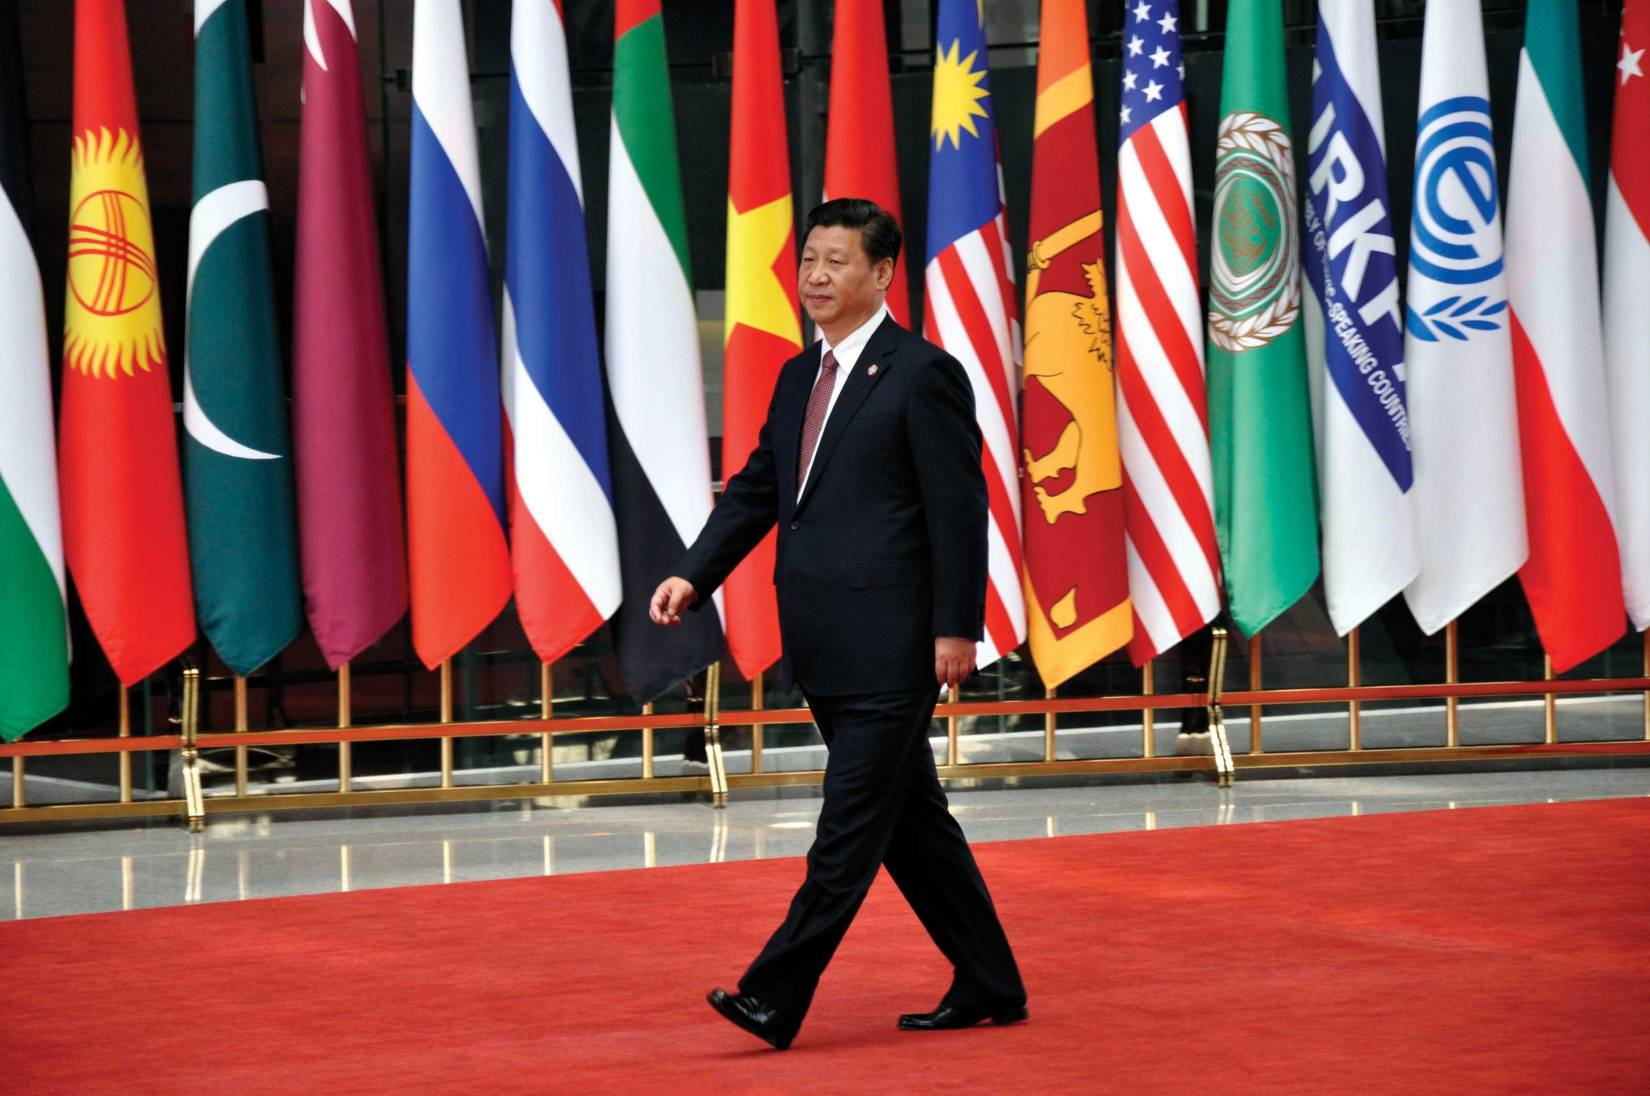 Китай «прошёлся» по США: «контратака» Пекина (часть 3)